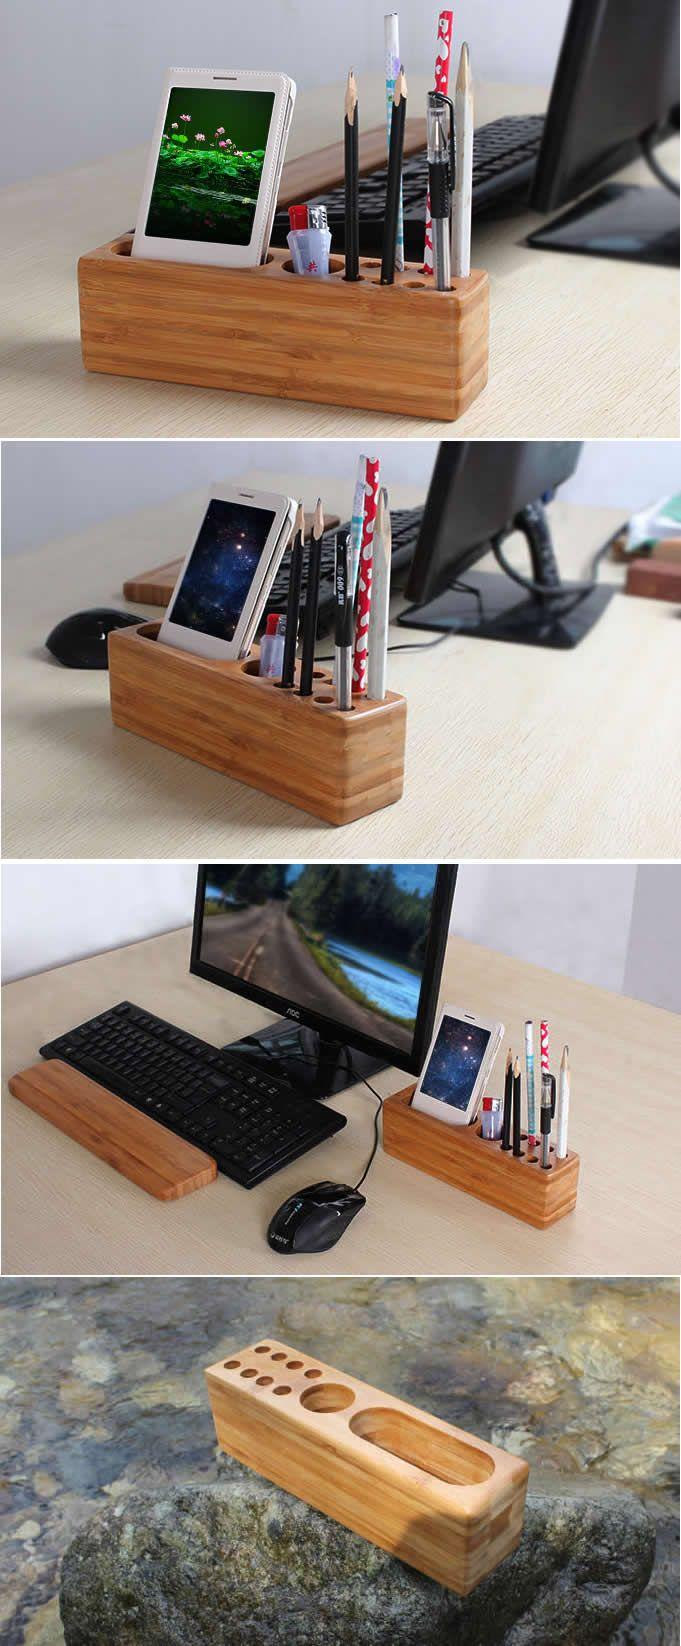 Wood Pen Pencil Holder Cell Phone Holder Stand Wooden Desk